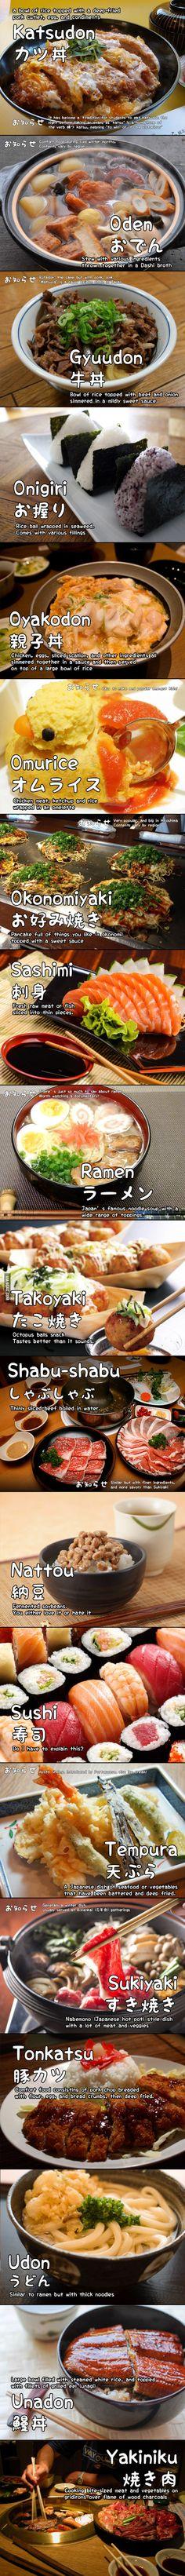 Popular Japanese Food 101